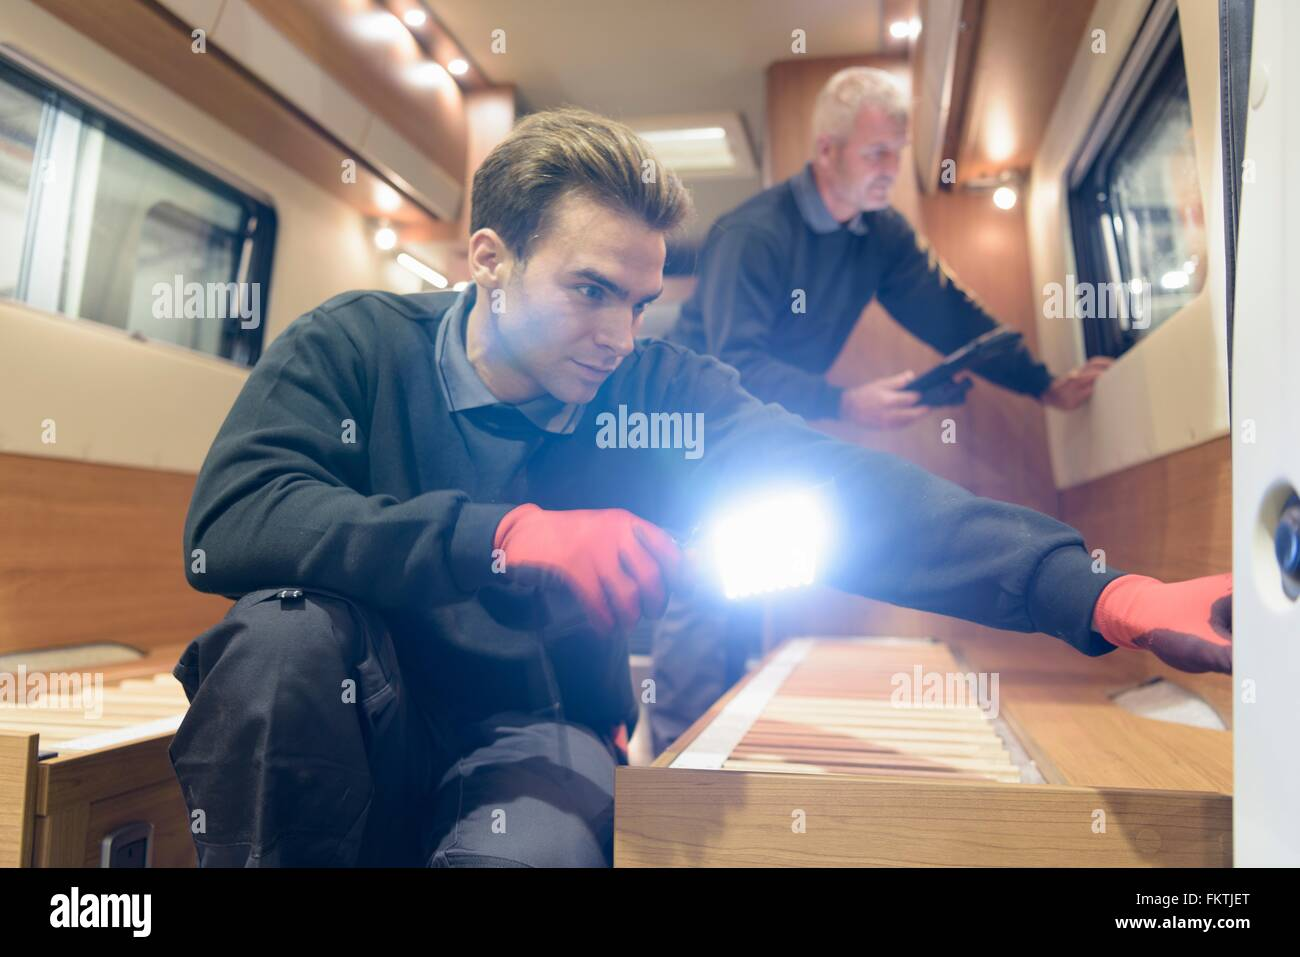 Arbeitnehmer, die Inspektion Fahrzeug auf Wohnmobil-Produktionslinie Stockbild